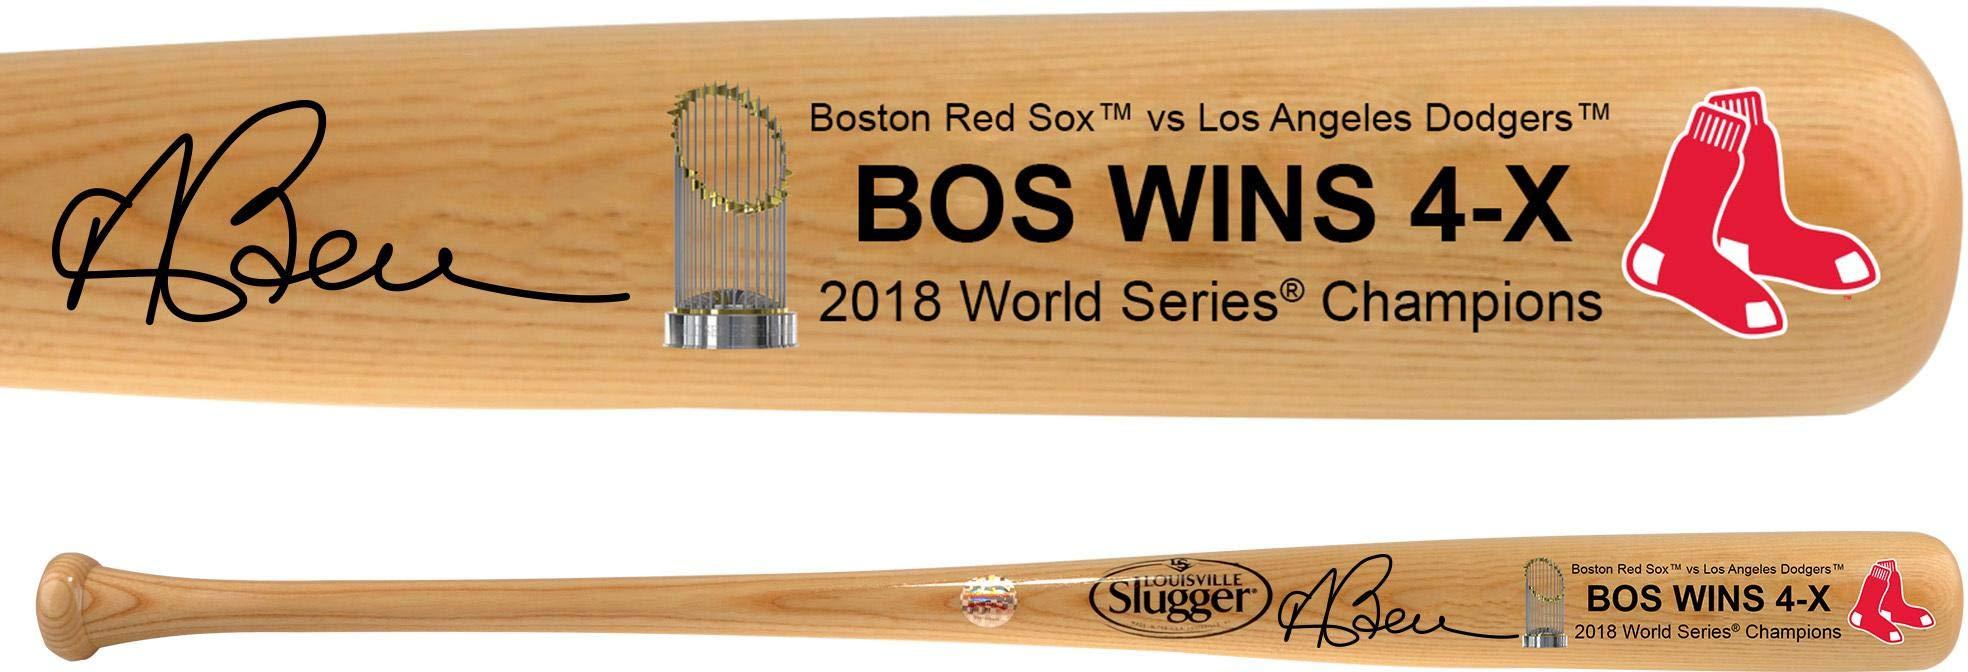 Andrew Benintendi Boston Red Sox 2018 MLB World Series Champions Autographed Louisville Slugger Blonde Logo Bat Fanatics Authentic Certified